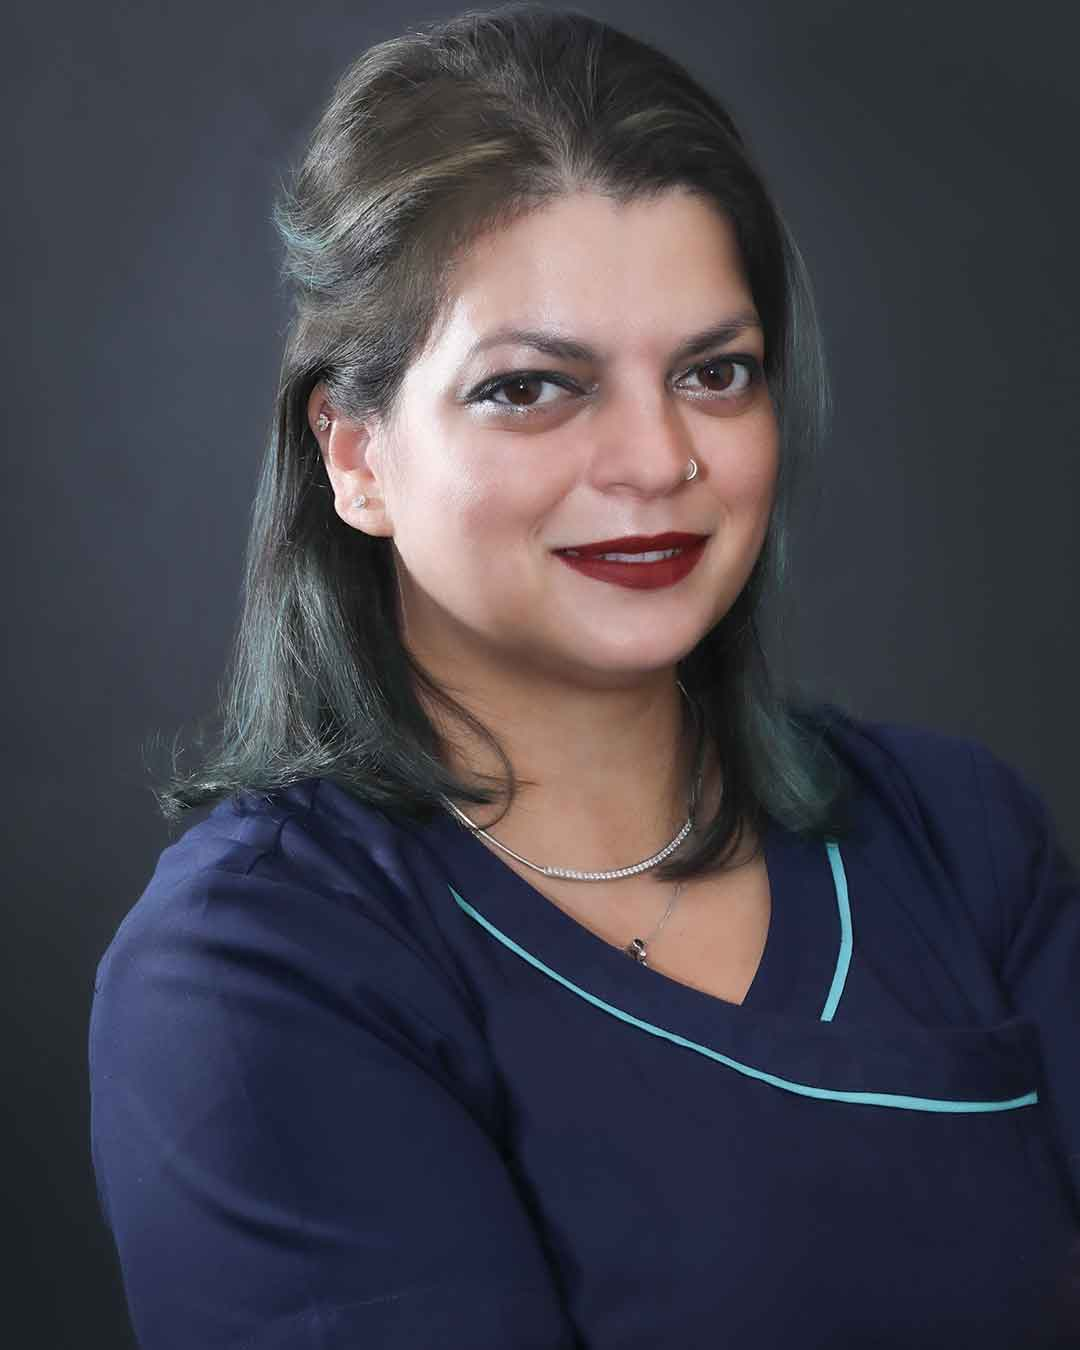 Dr. Shaista Siddiqui